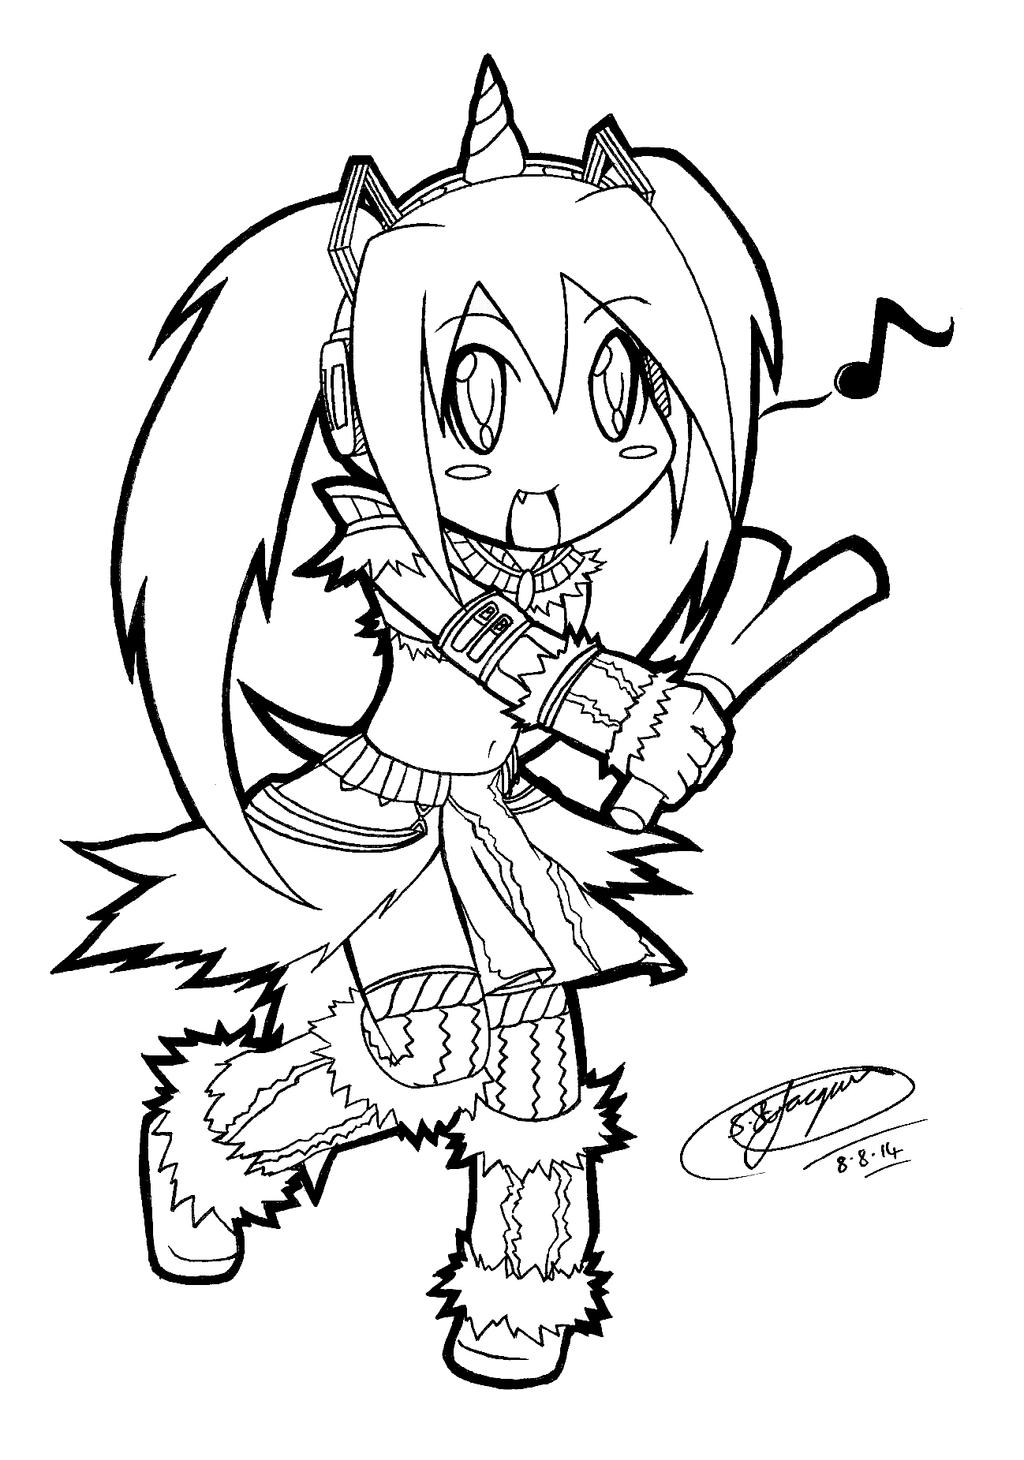 chibi miku hatsune in monster hunter cosplay 3 by shannonxnaruto on deviantart